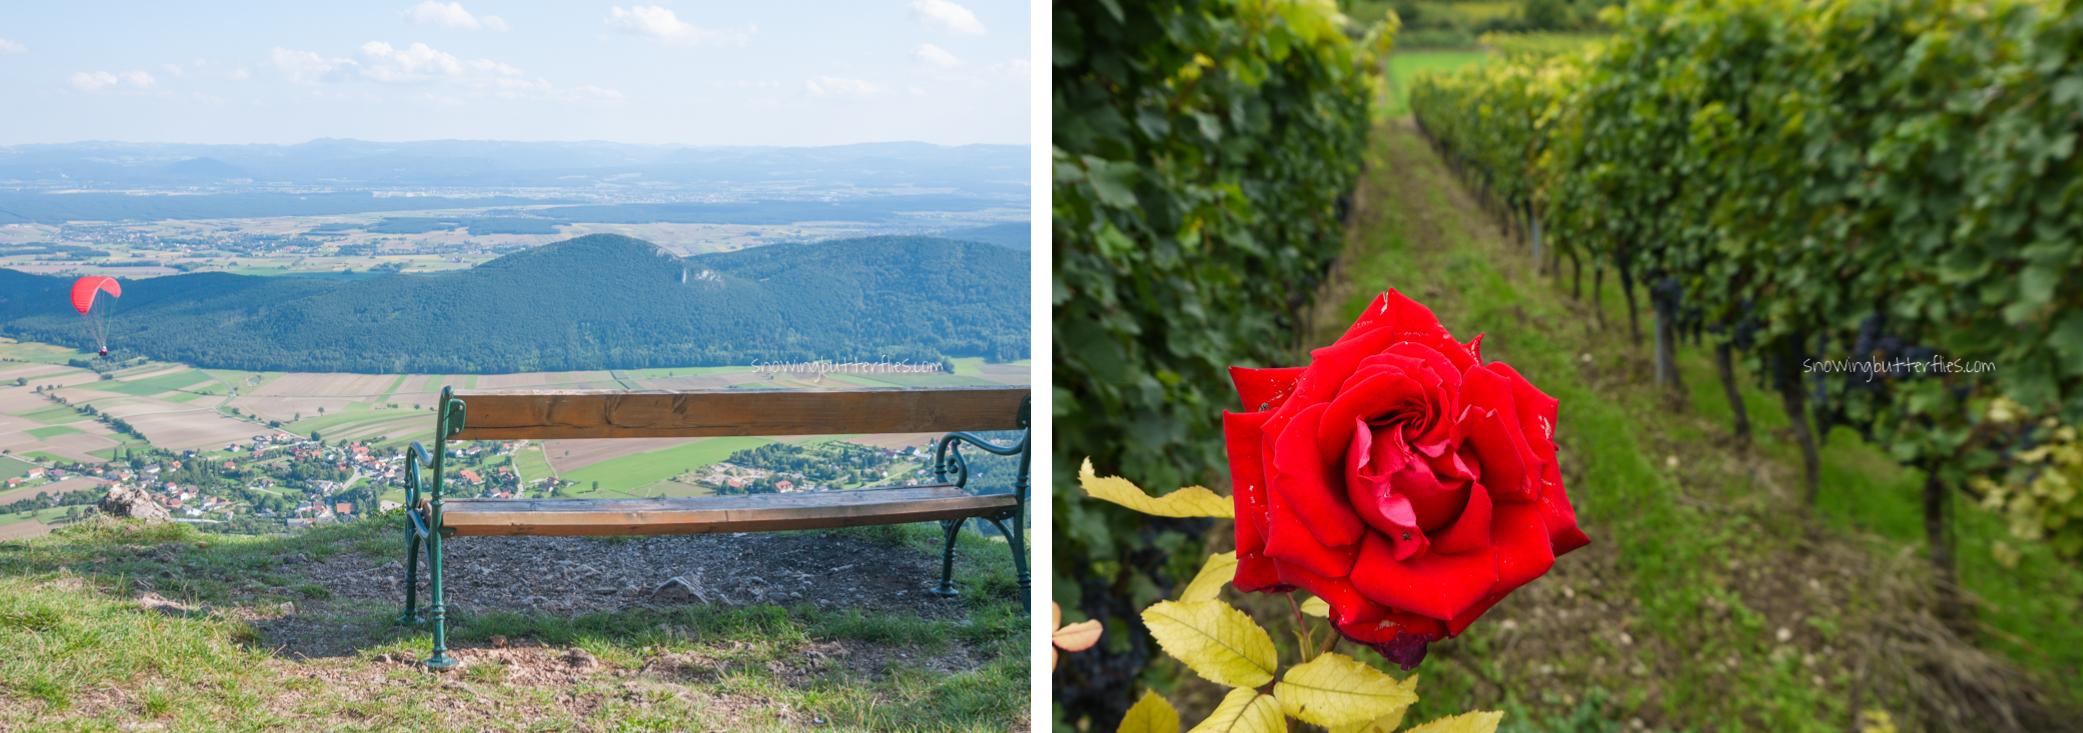 mariana perrone, austria, snowing butterflies, still life, landscape, seasons, rose, hohewand